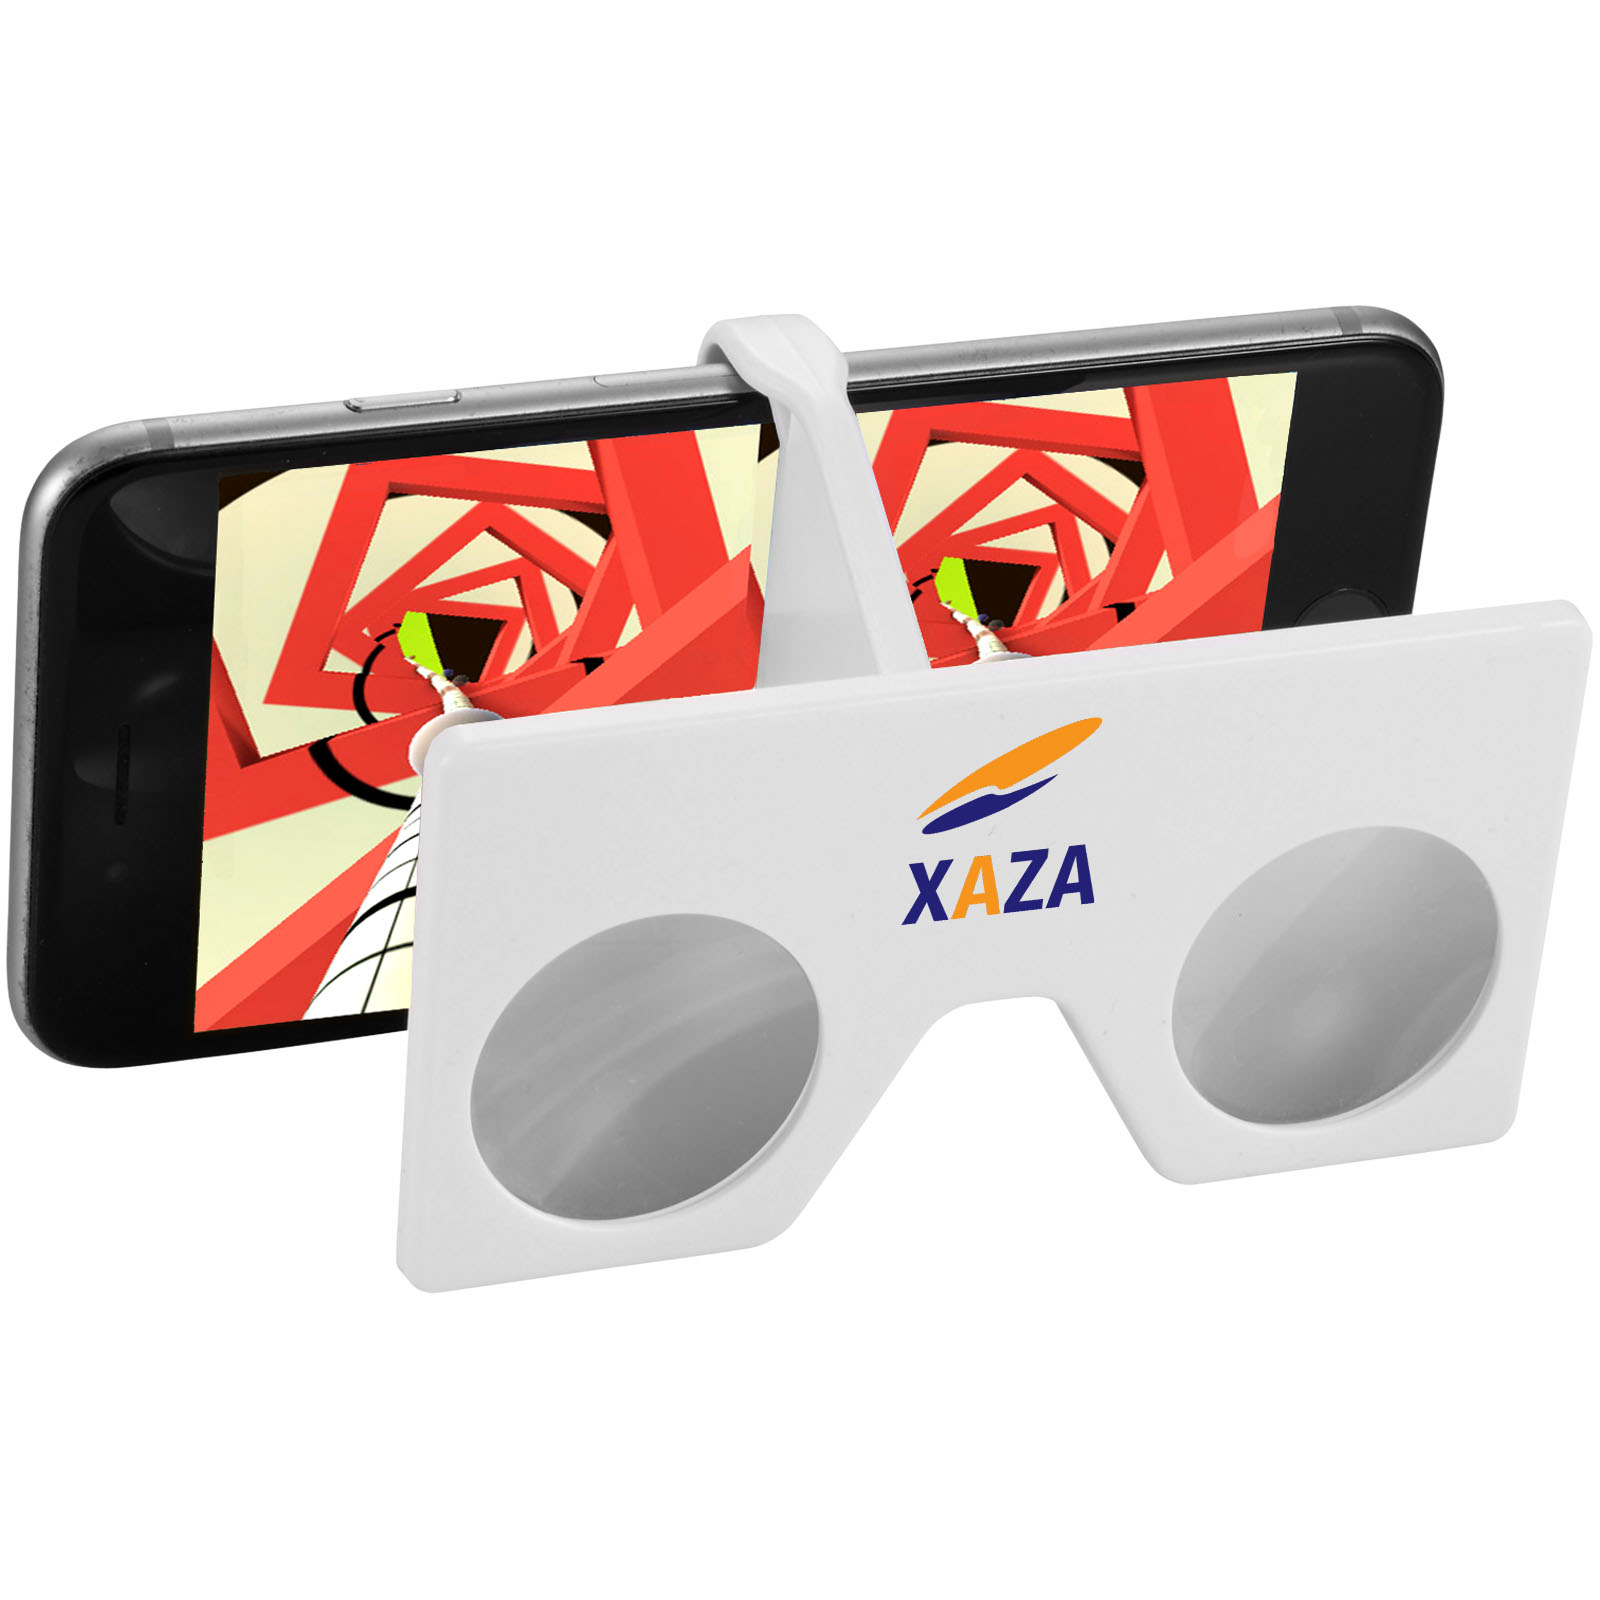 3642c1759ed134 Virtual Reality bril met 3D lens set bedrukken  - Voordelig   snel ...